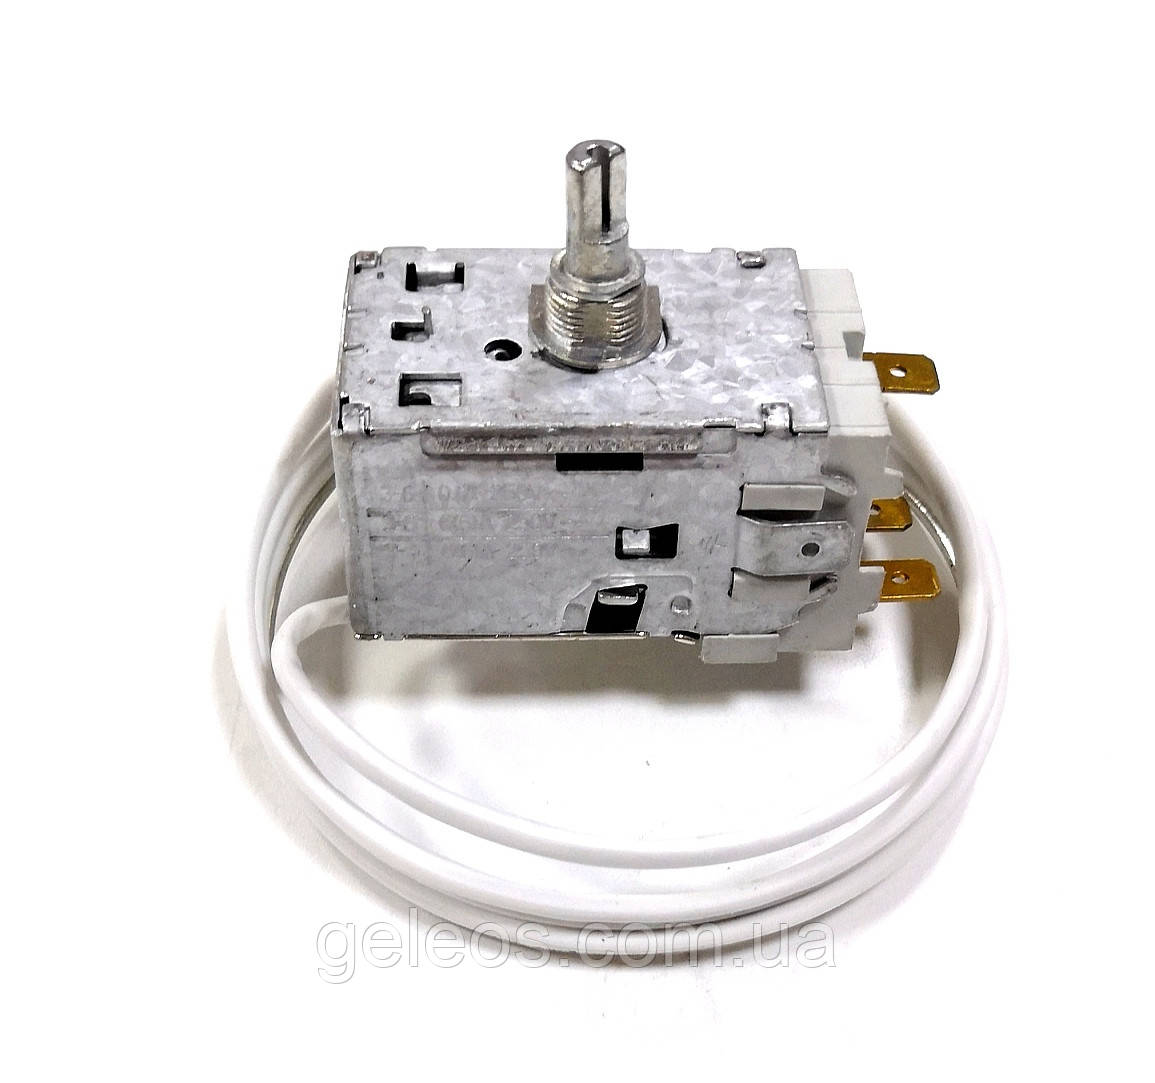 Термостат ATEA A13 - 1000 двухкамерн. для холодильника. Китай